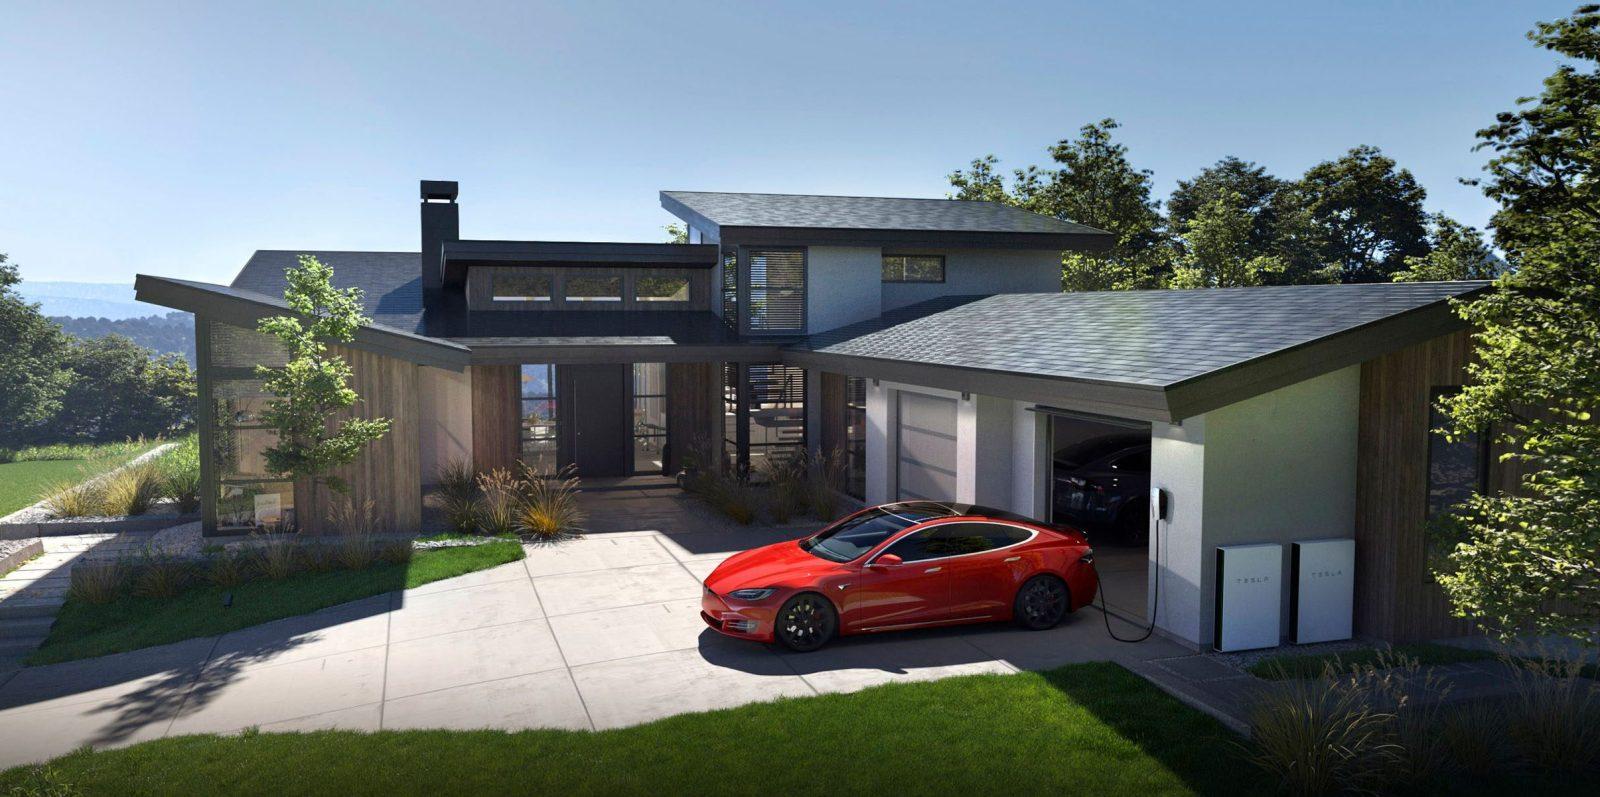 Tesla Energy deploys a new record amount of energy storage, solar still down